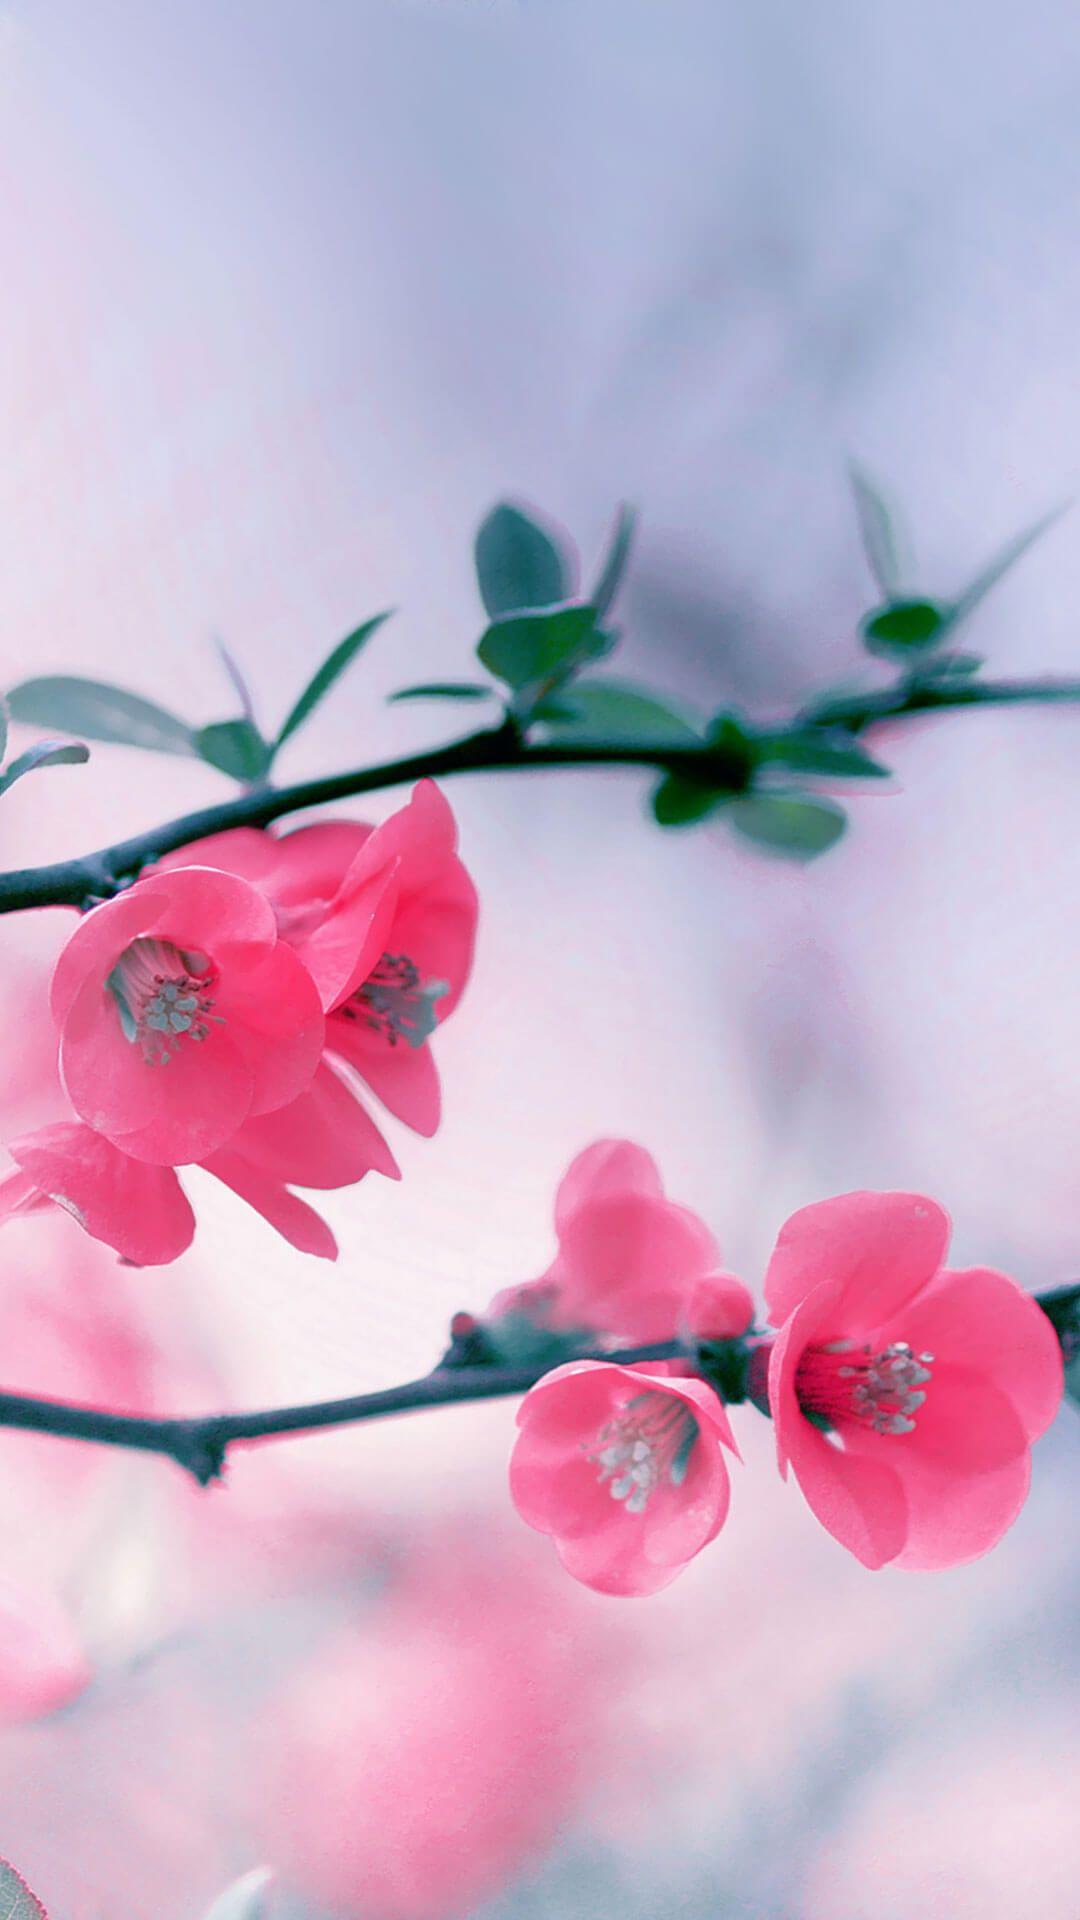 Cherry blossom flowers iphone 6 wallpaper hd flowers wallpapers cherry blossom flowers iphone 6 wallpaper hd mightylinksfo Choice Image